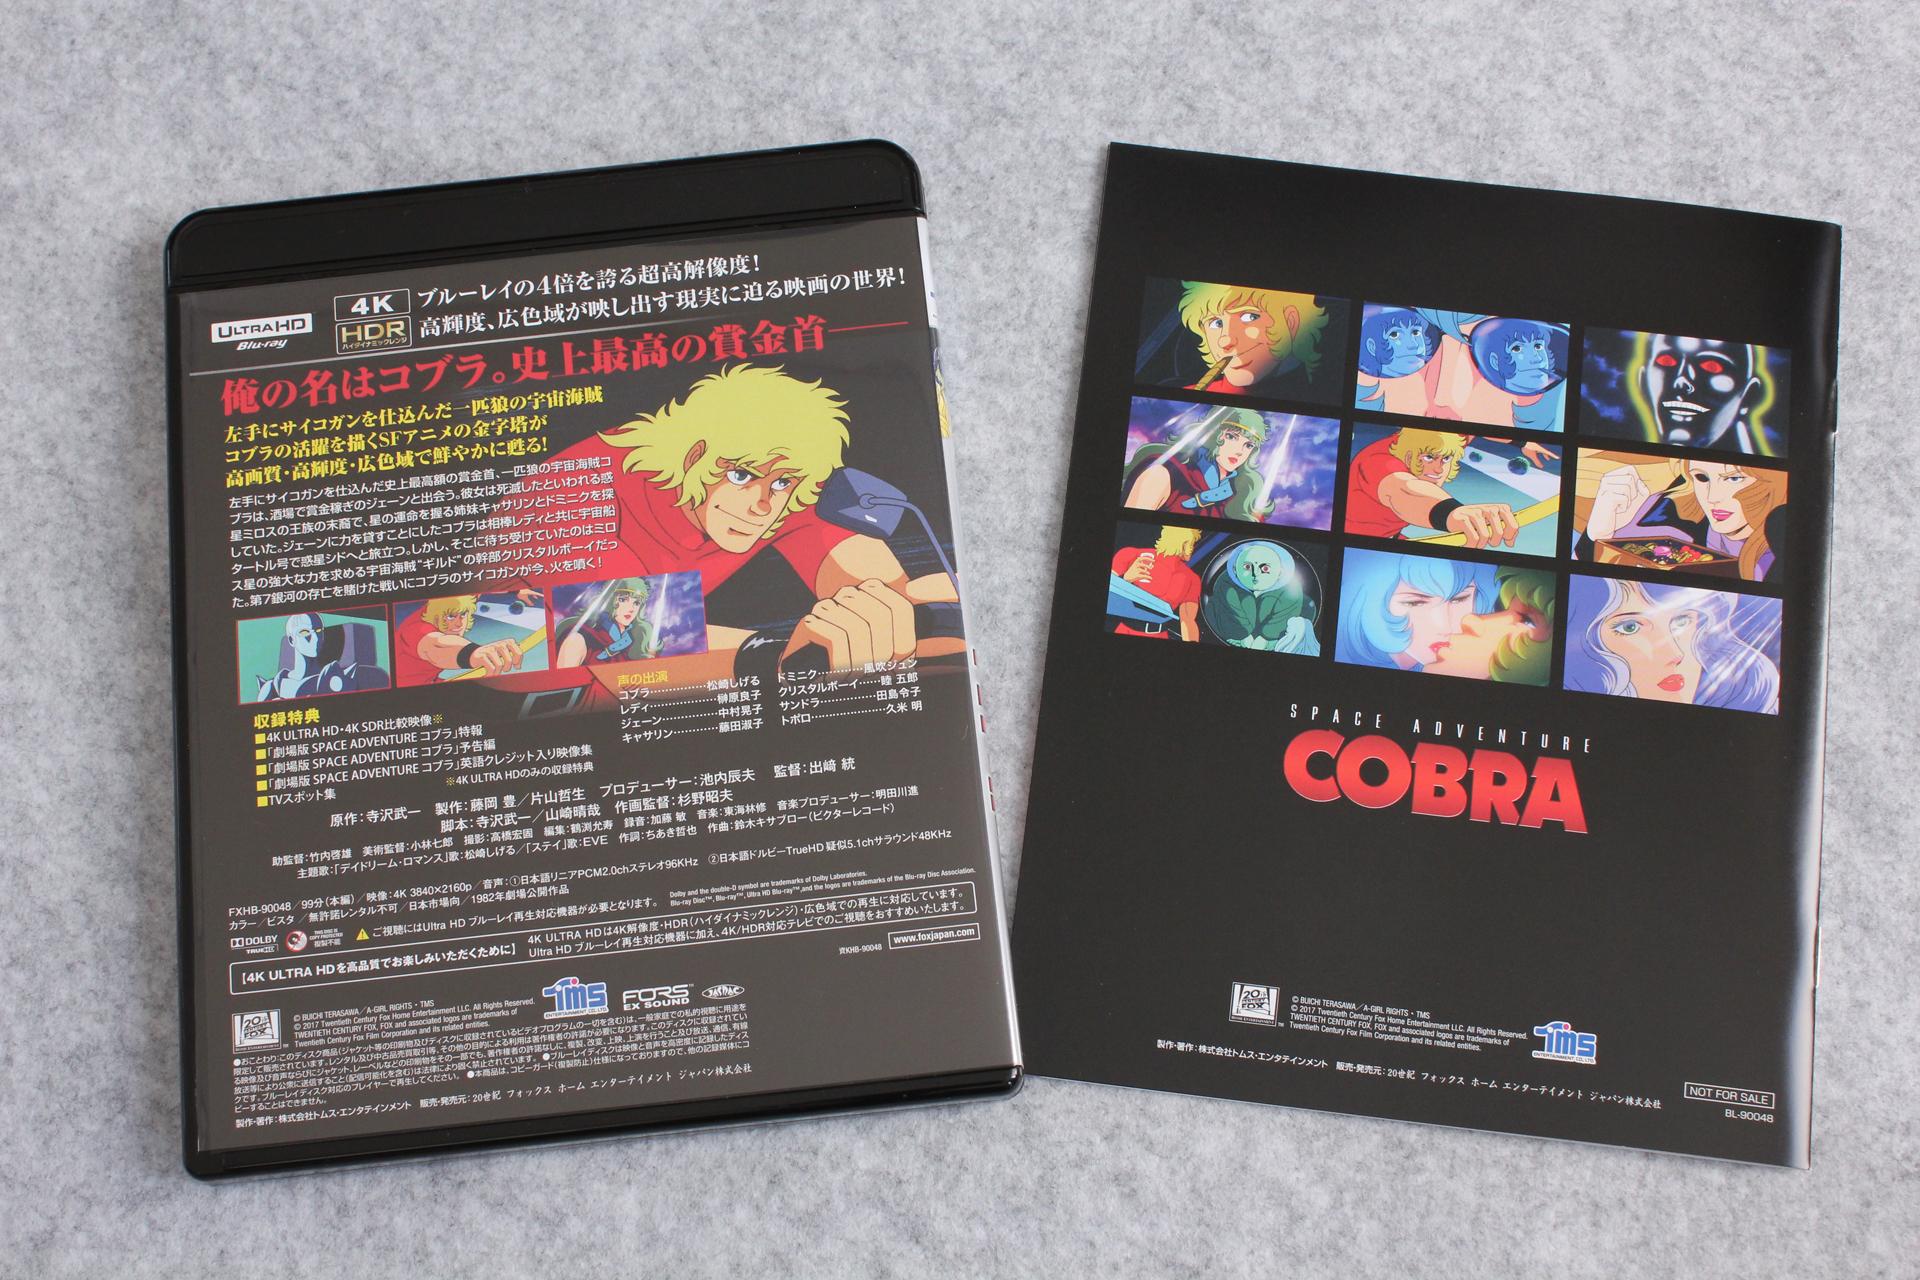 2017-12-19-COBRA_4KUHDBD-4.JPG